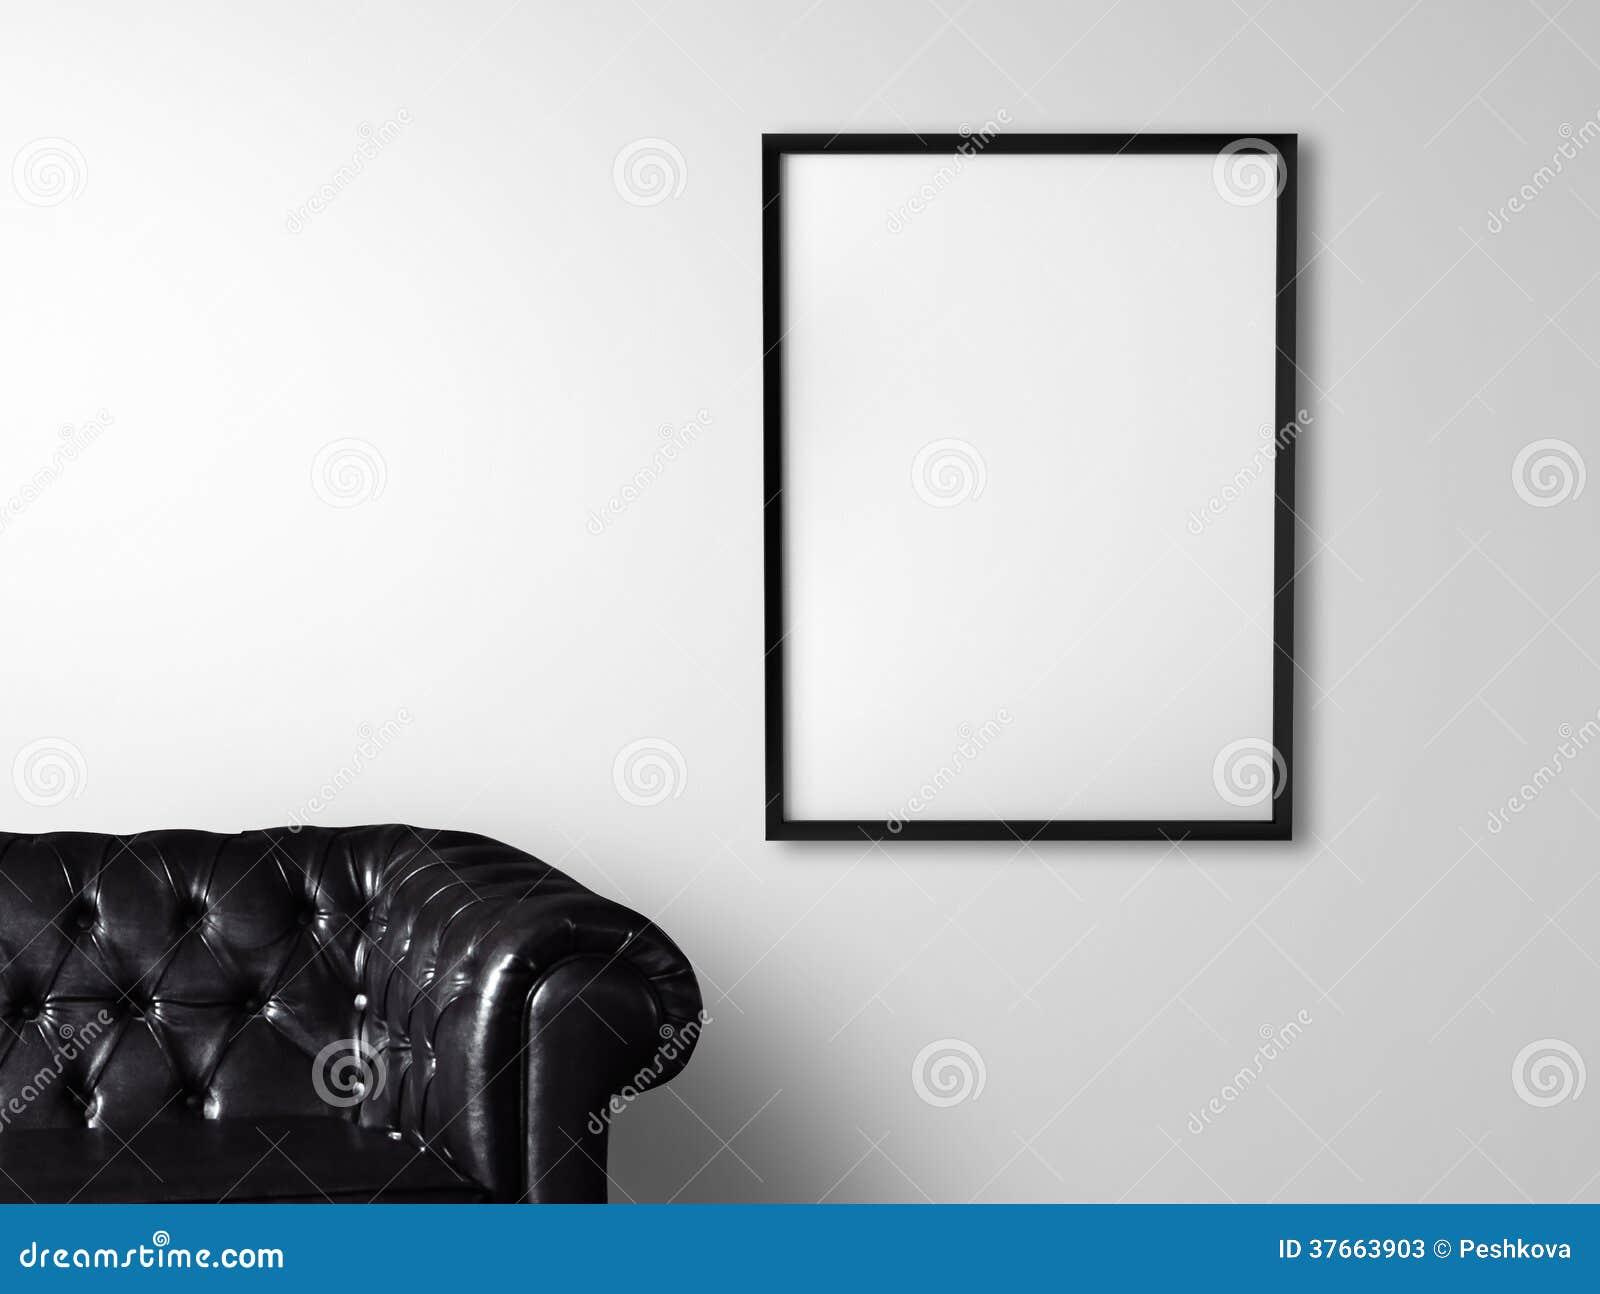 Sofa And Poster Stock Photos Image 37663903